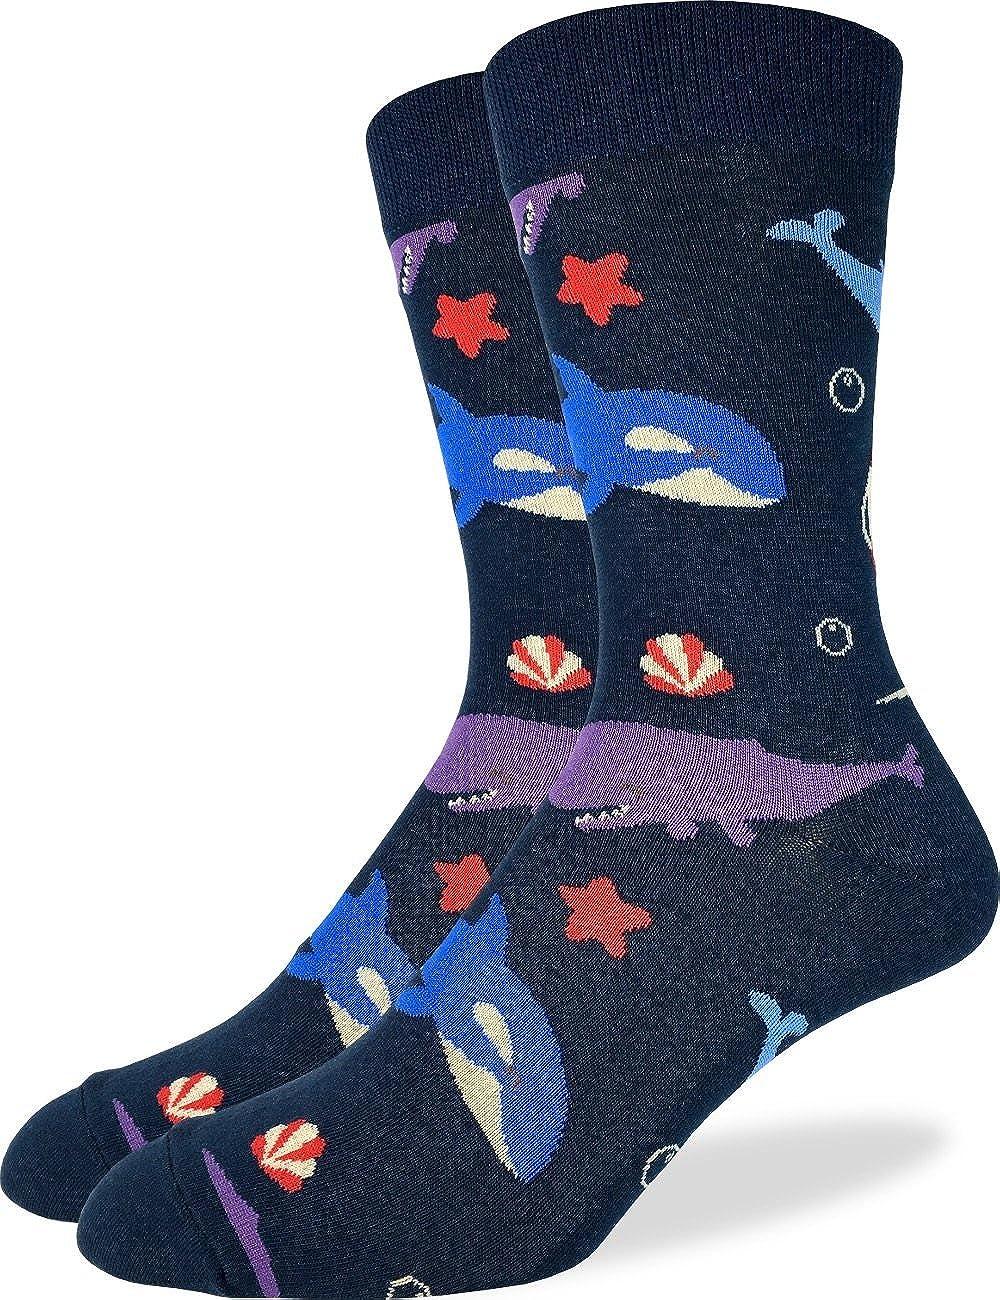 Good Luck Sock Men's Whales Crew Socks - Blue, Shoe Size 7-12 1363